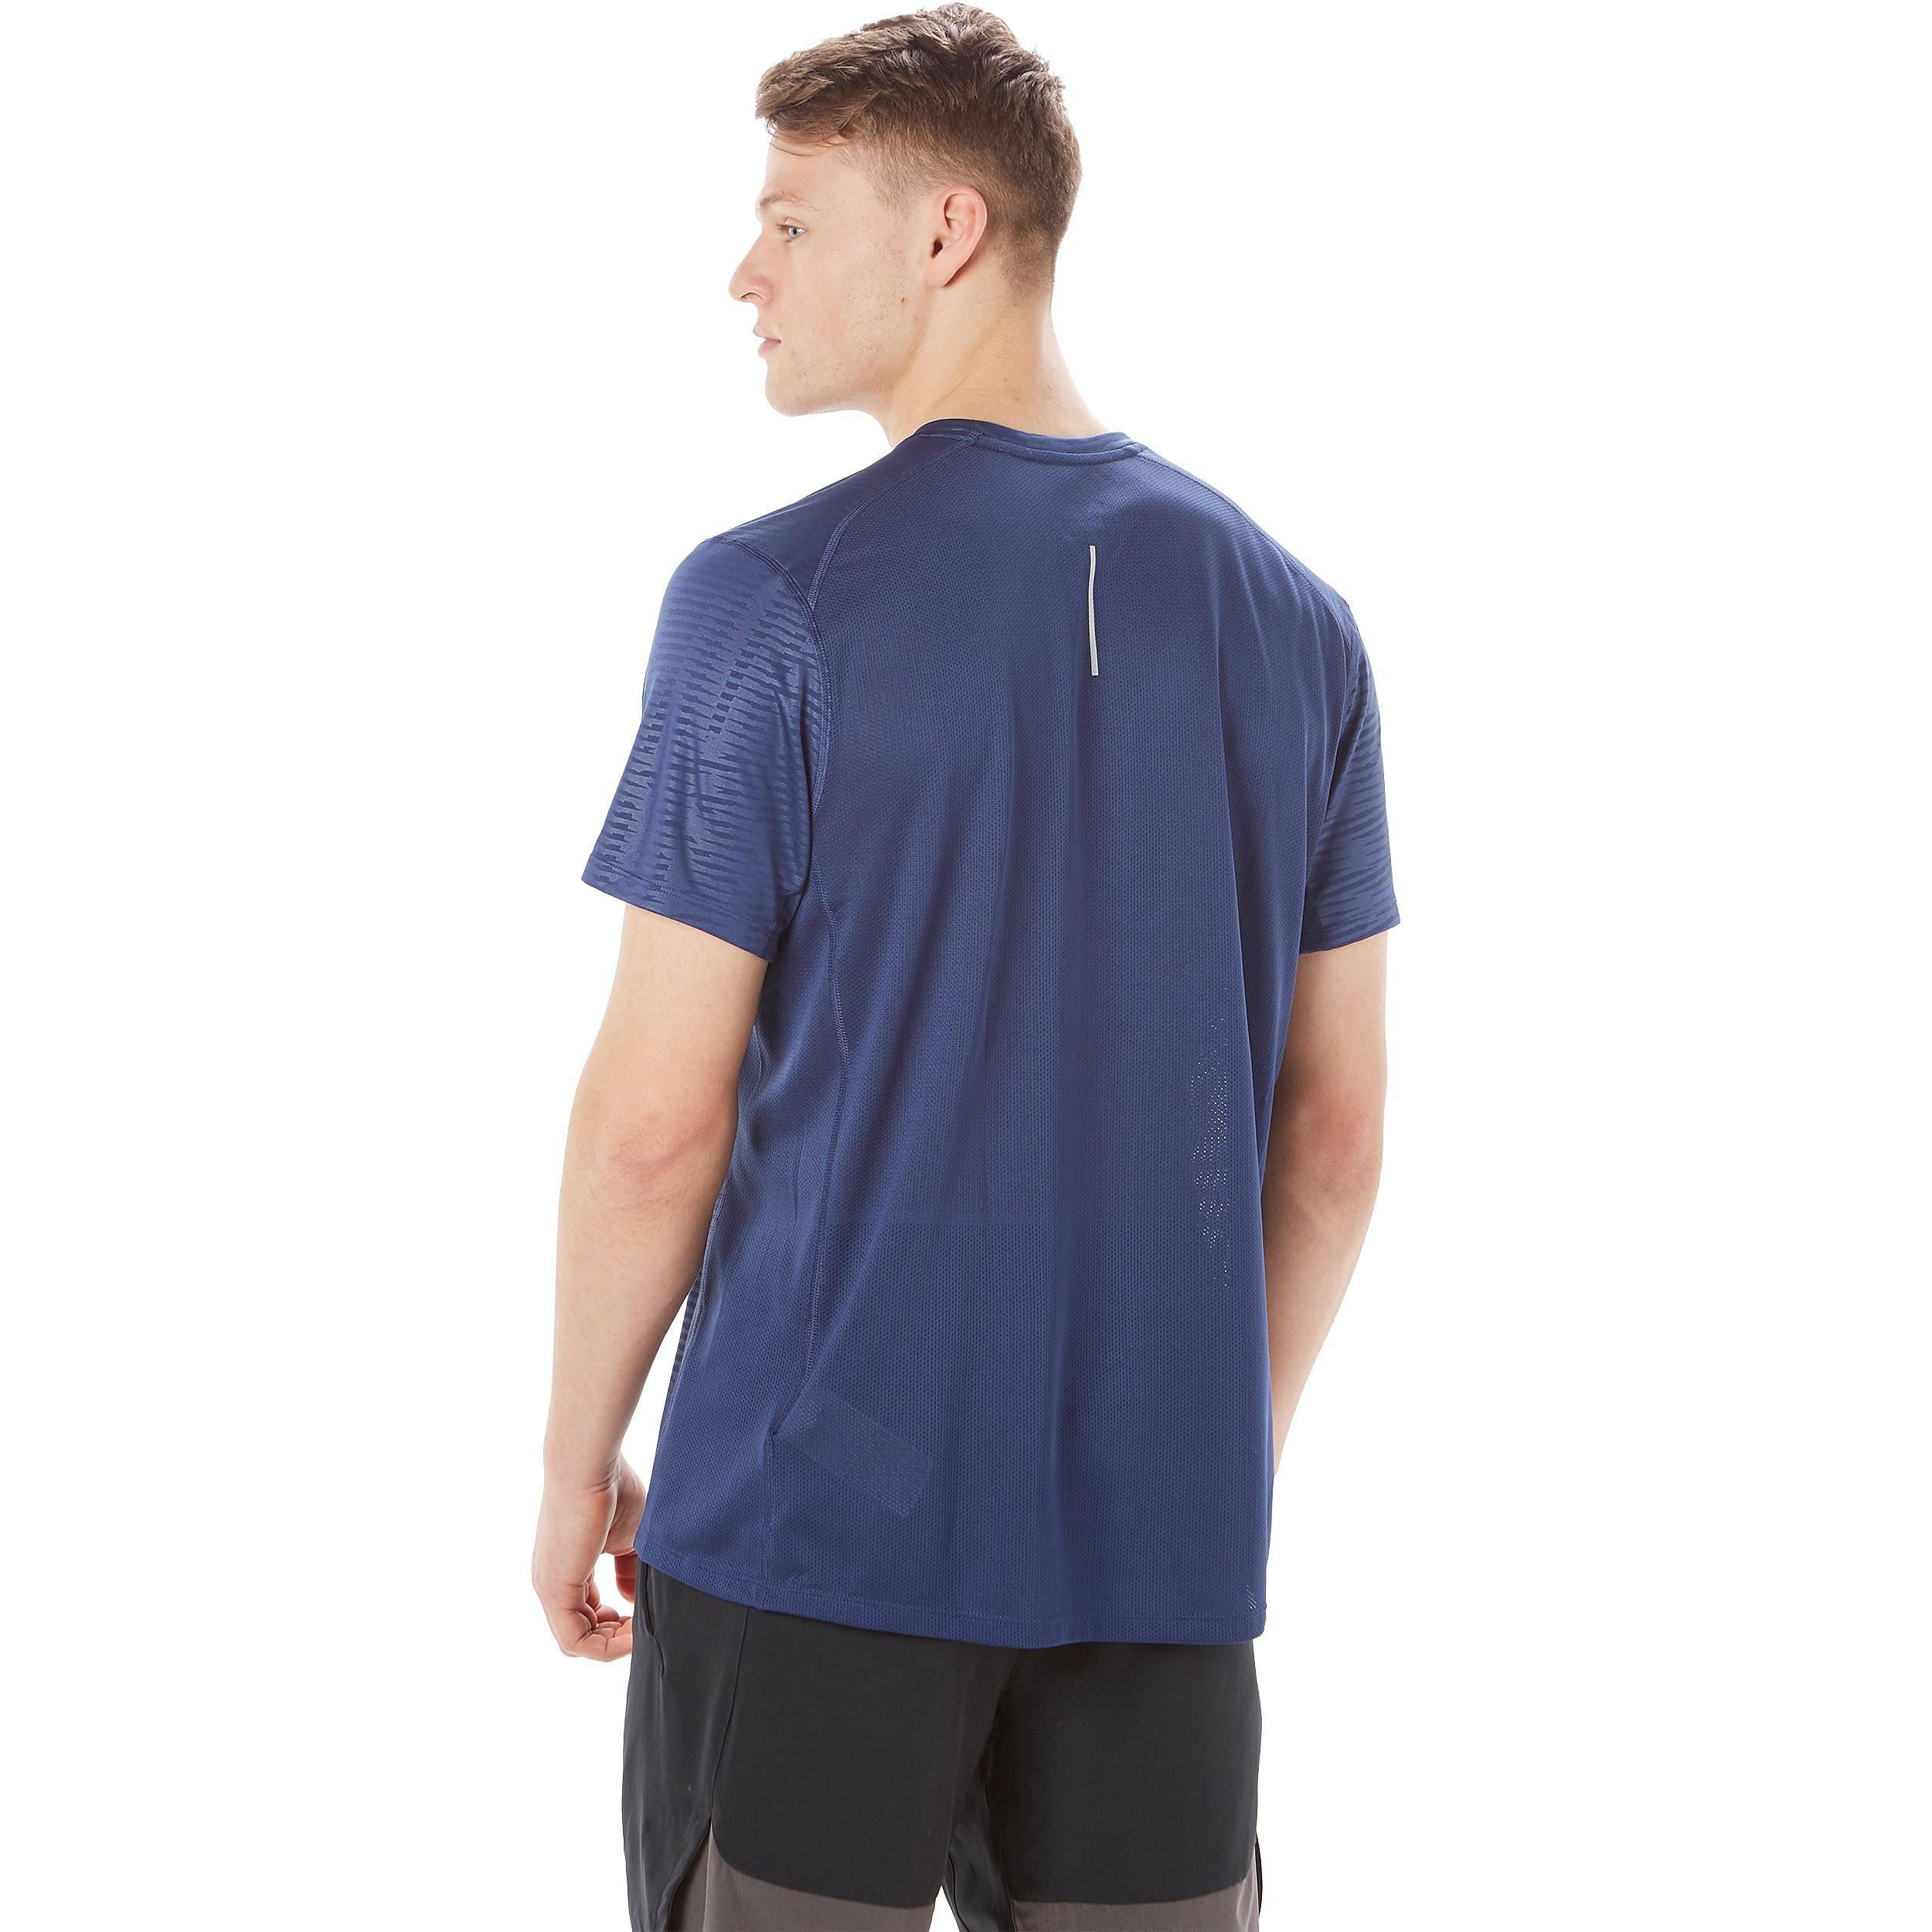 Nike Dry Miler Performance T-Shirt